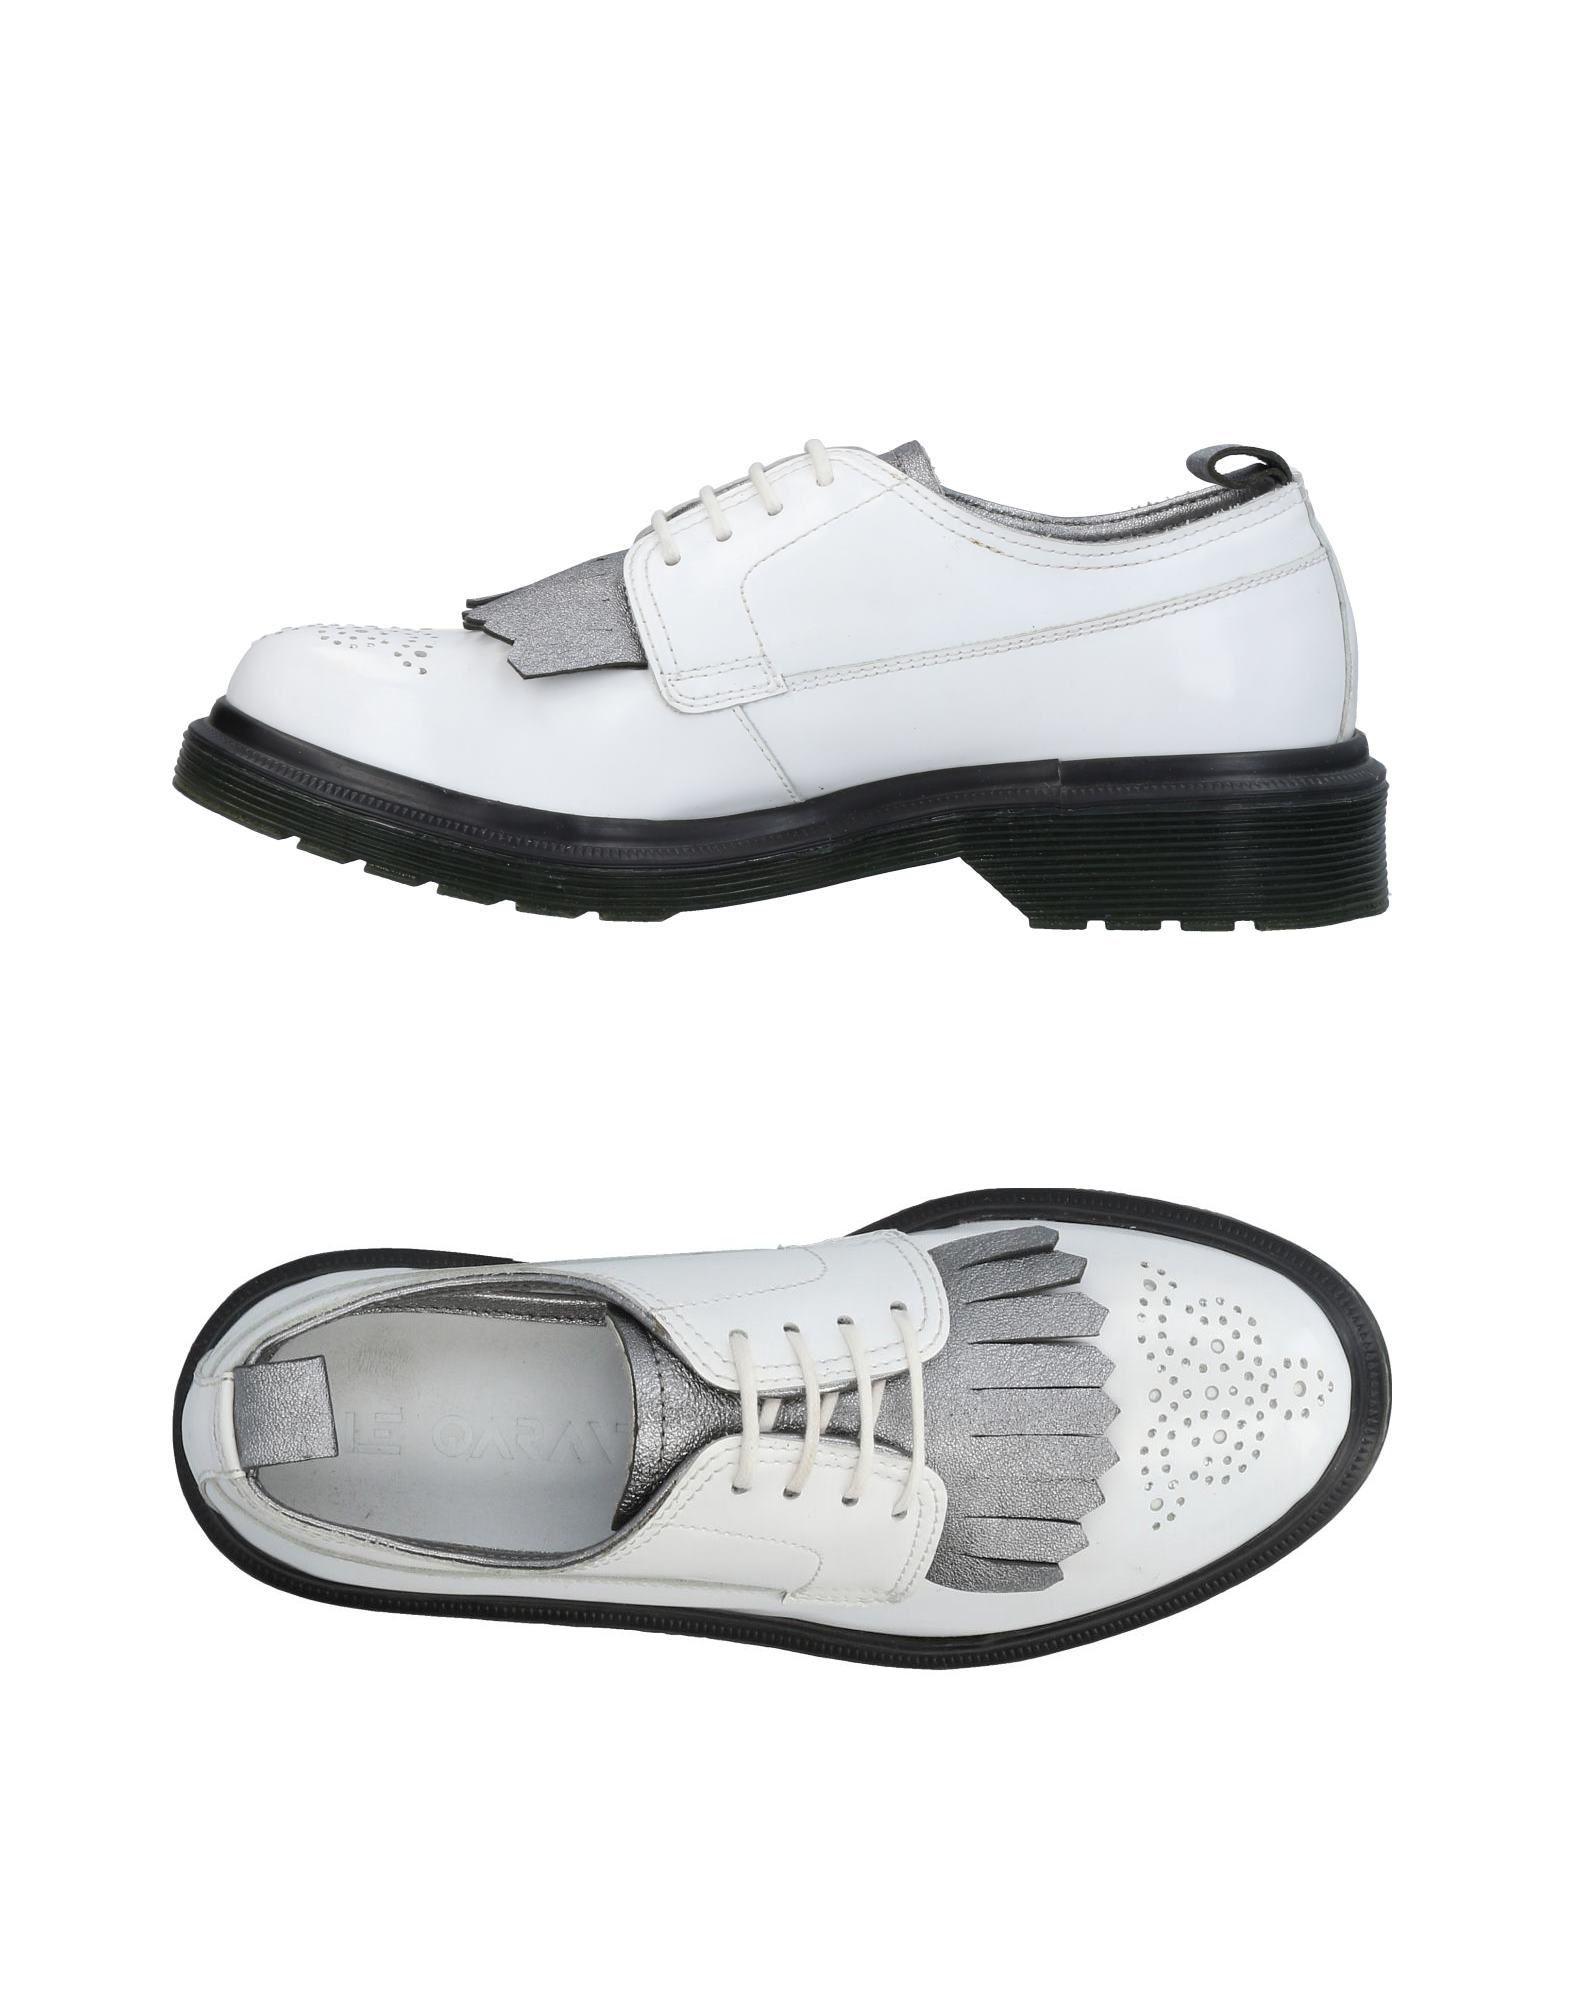 CHAUSSURES - Chaussures à lacetsLe Qarant lltFaCImn